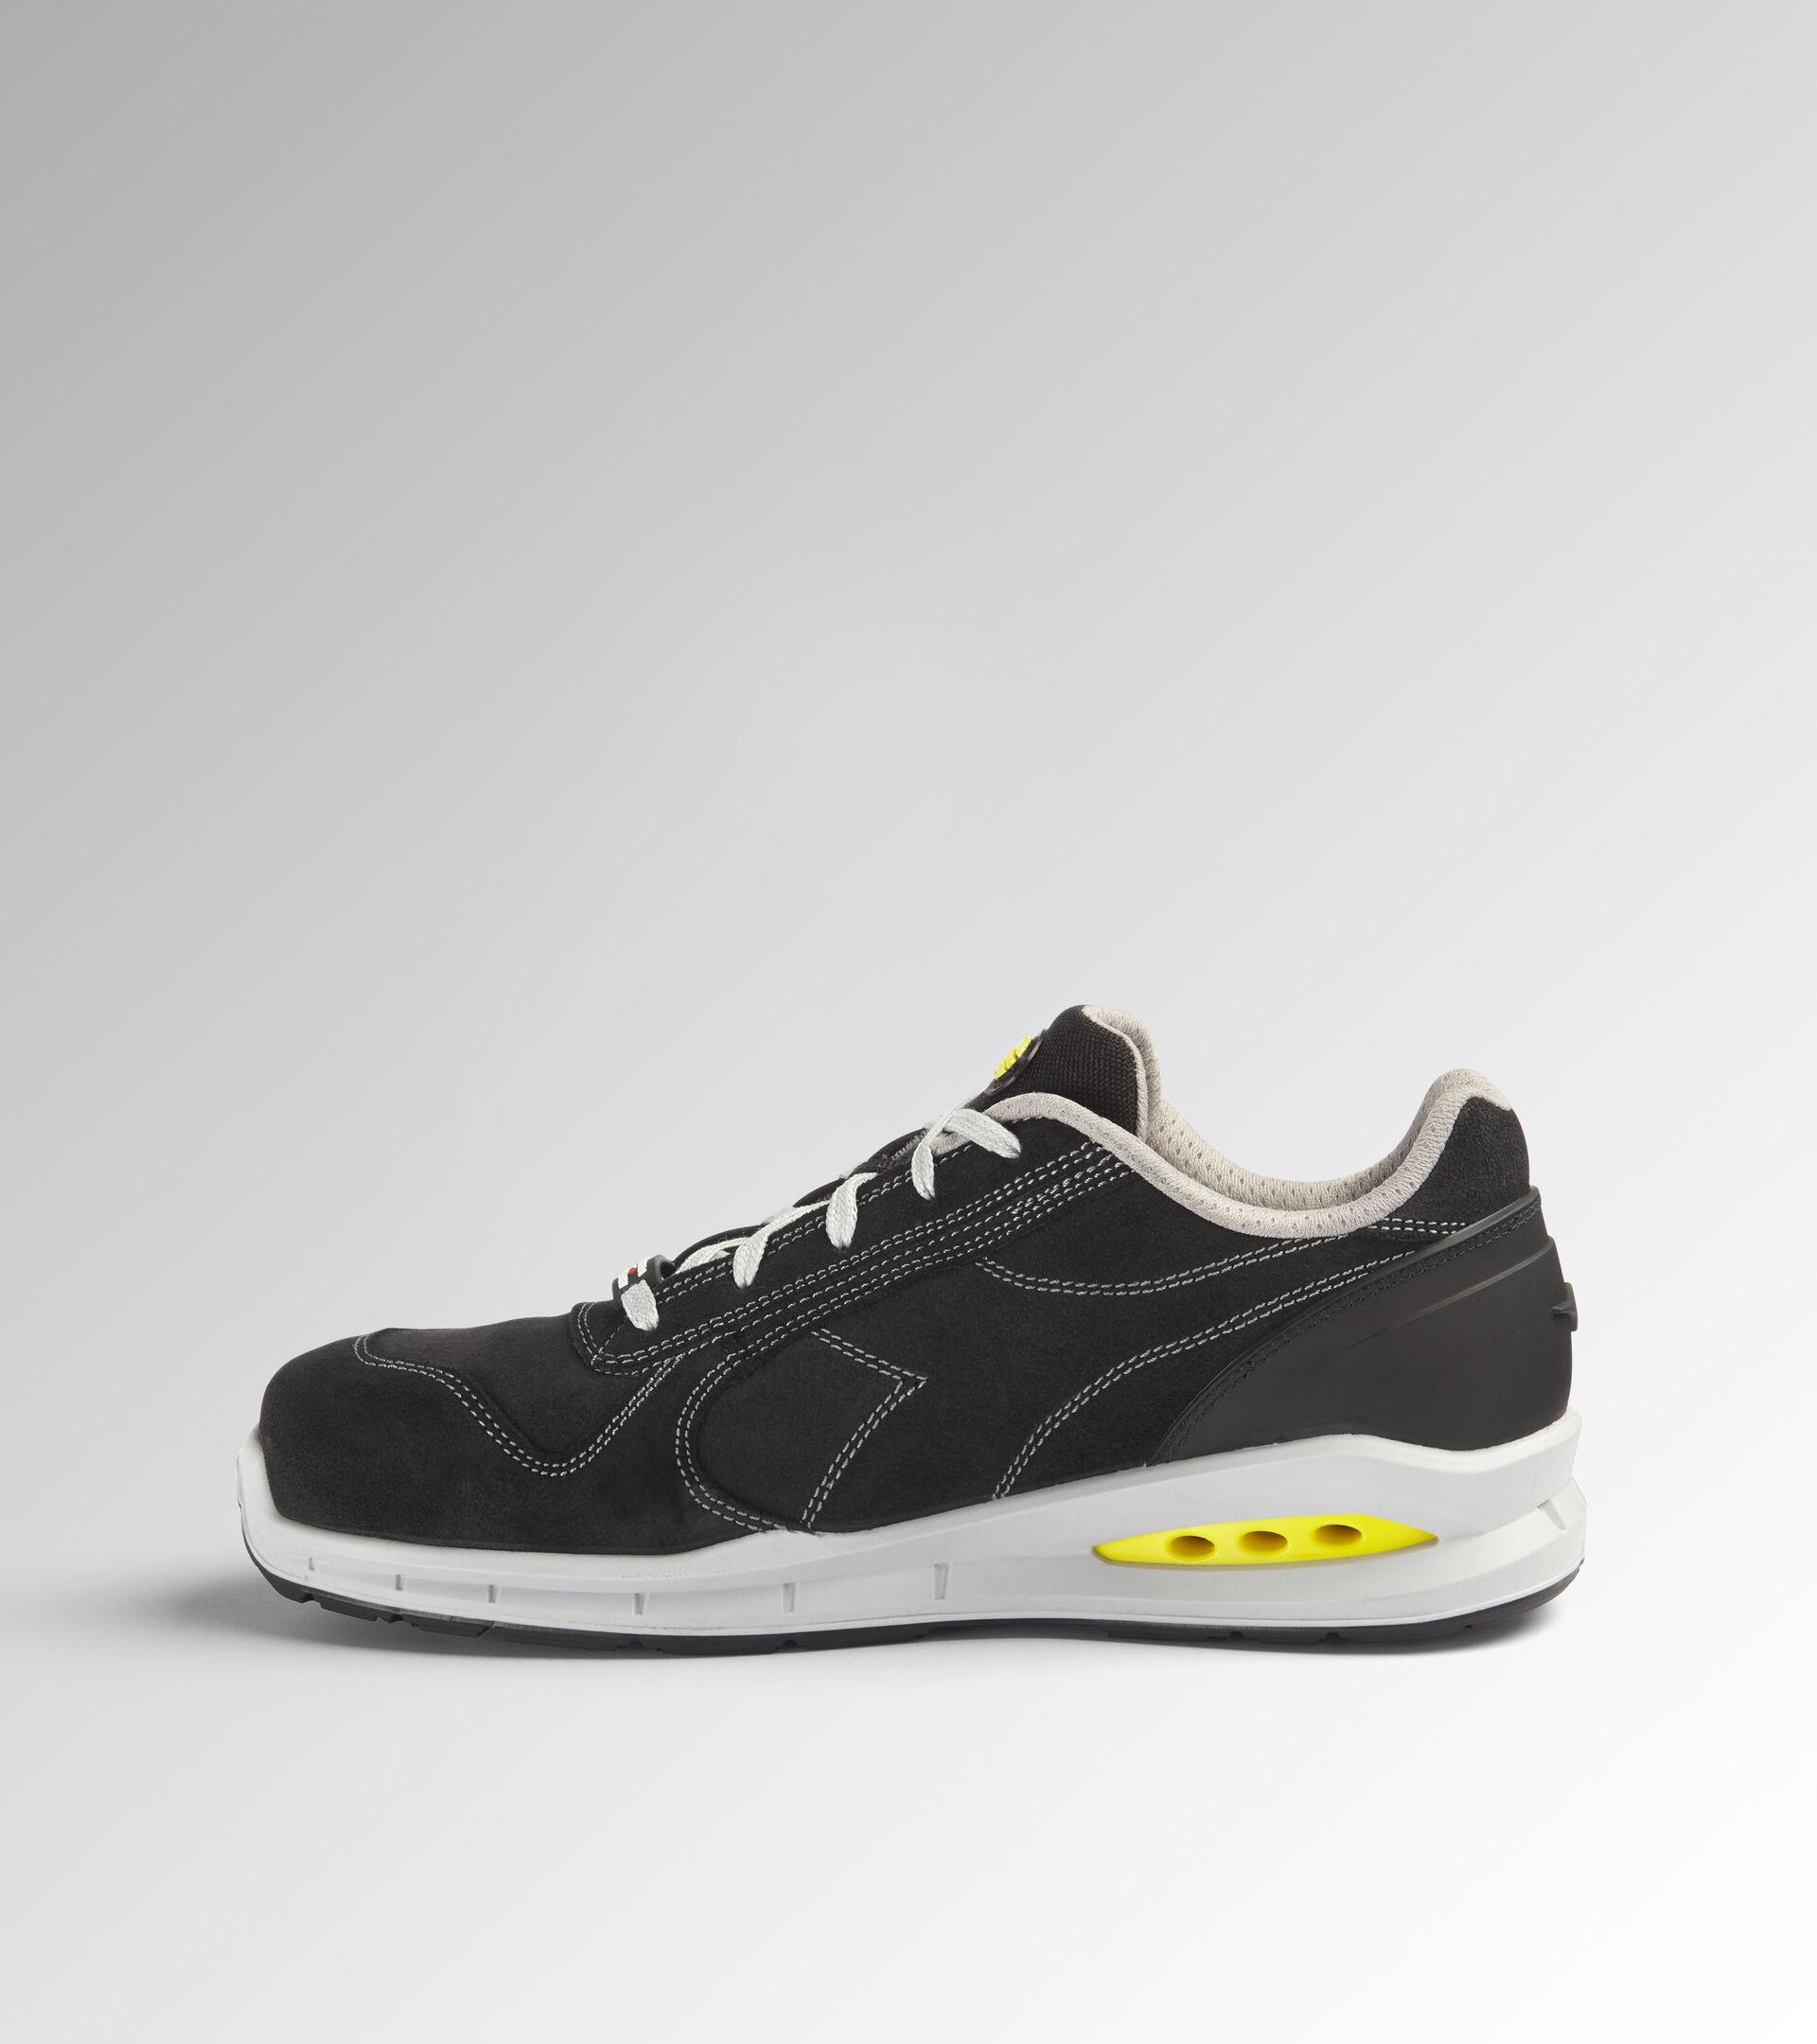 Footwear Utility UNISEX RUN NET AIRBOX LOW S3 SRC BLACK /BLACK Utility